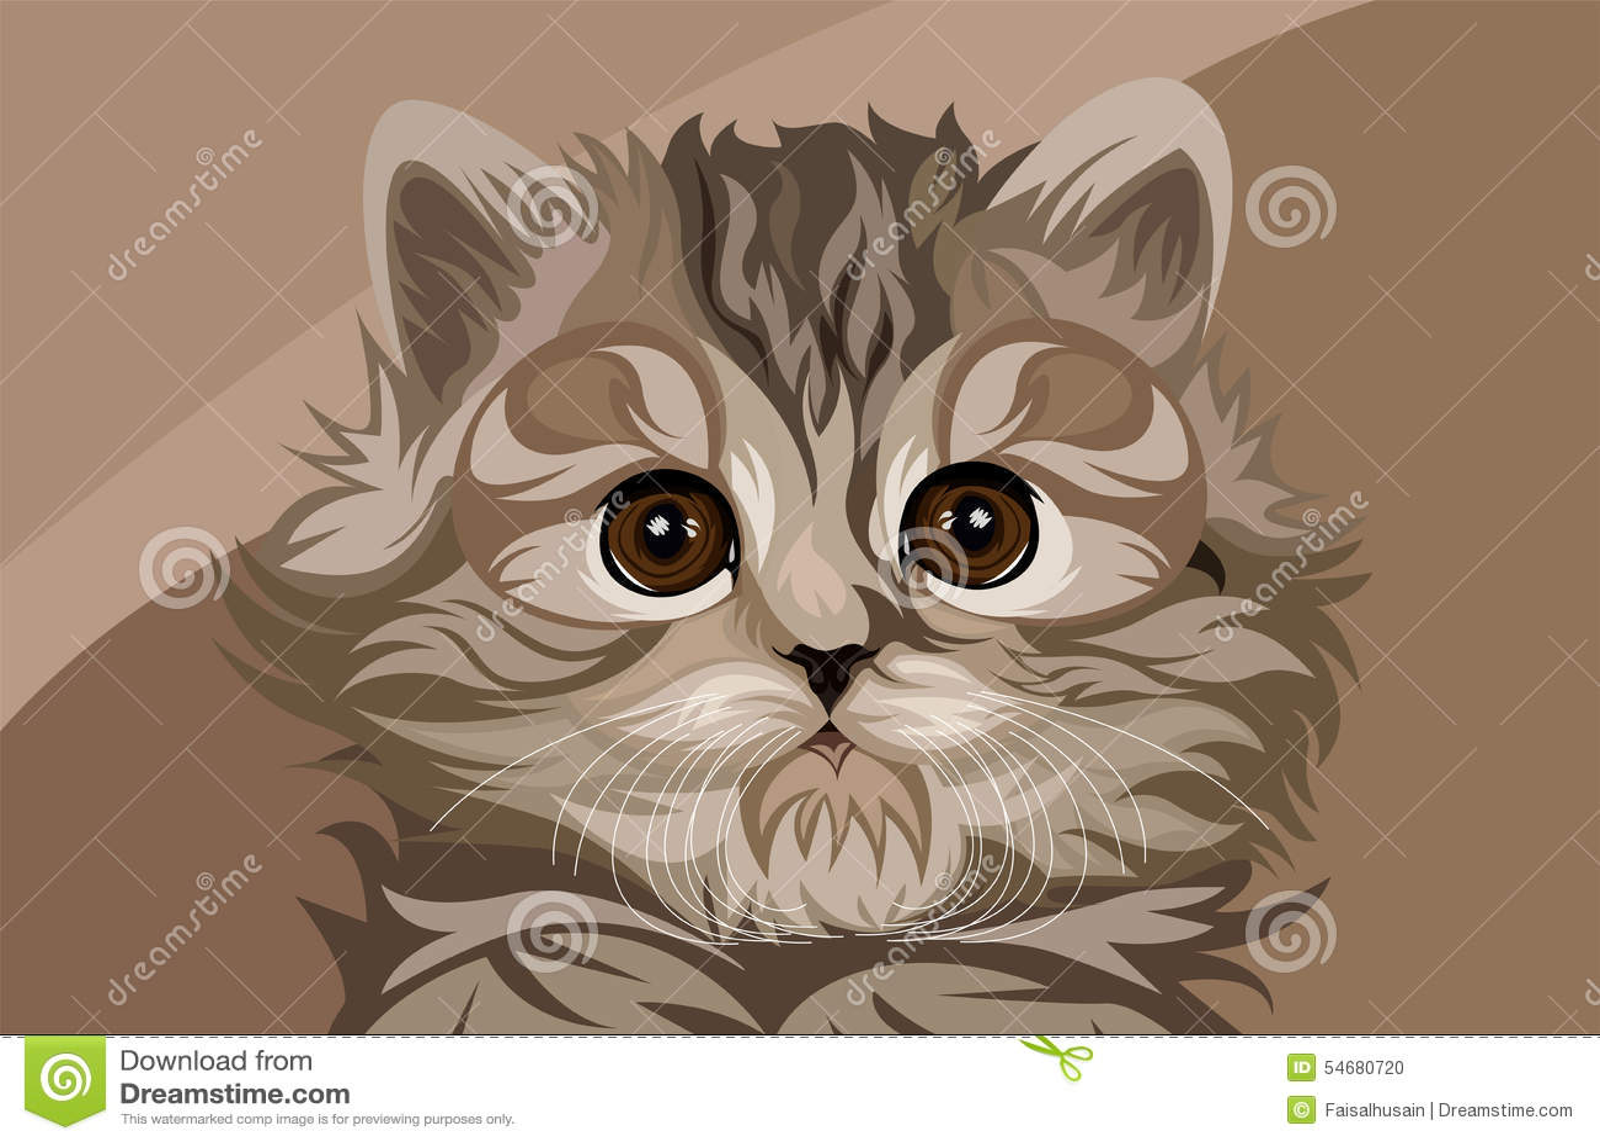 Cute Kawaii Animal Wallpapers Cute Cat Vector Stock Illustration Image 54680720